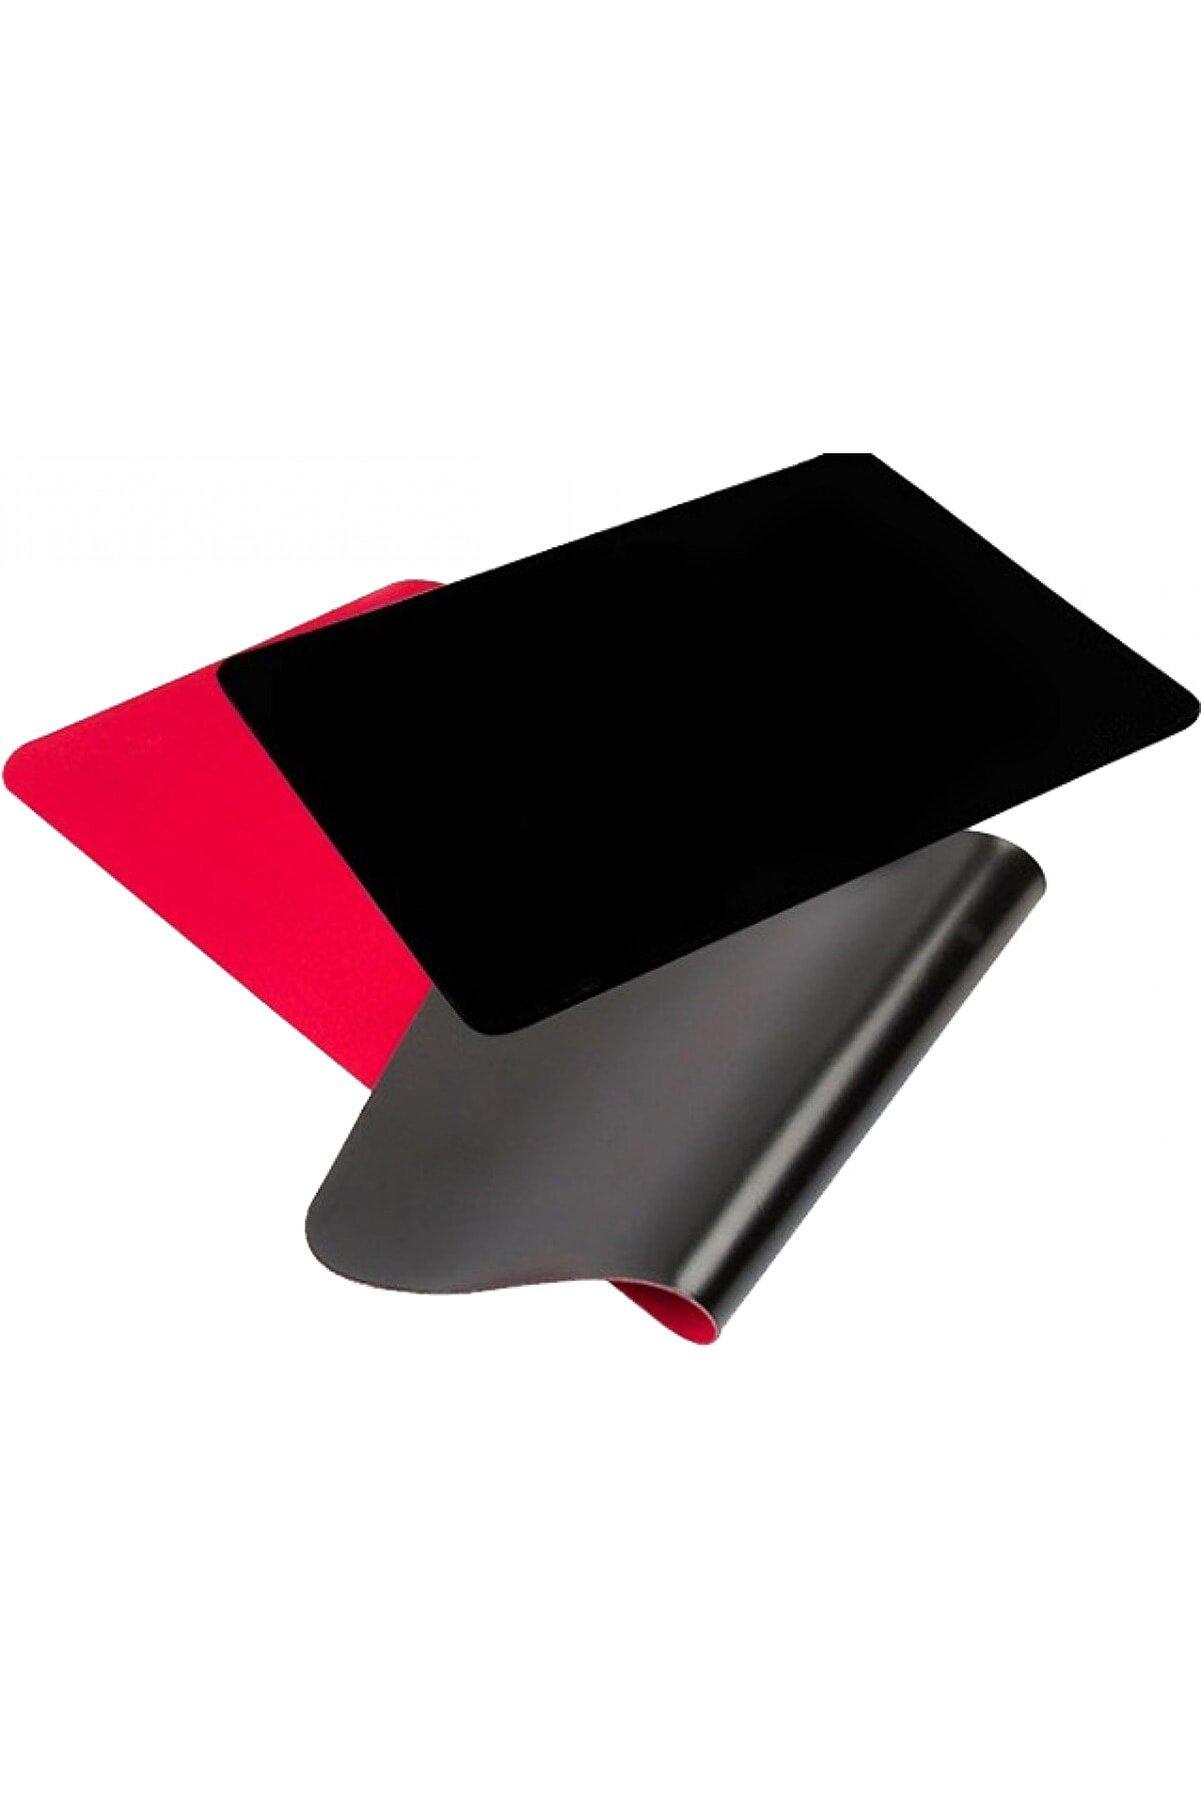 J-TECH Mouse Pad Kaymaz Taban 18x23cm